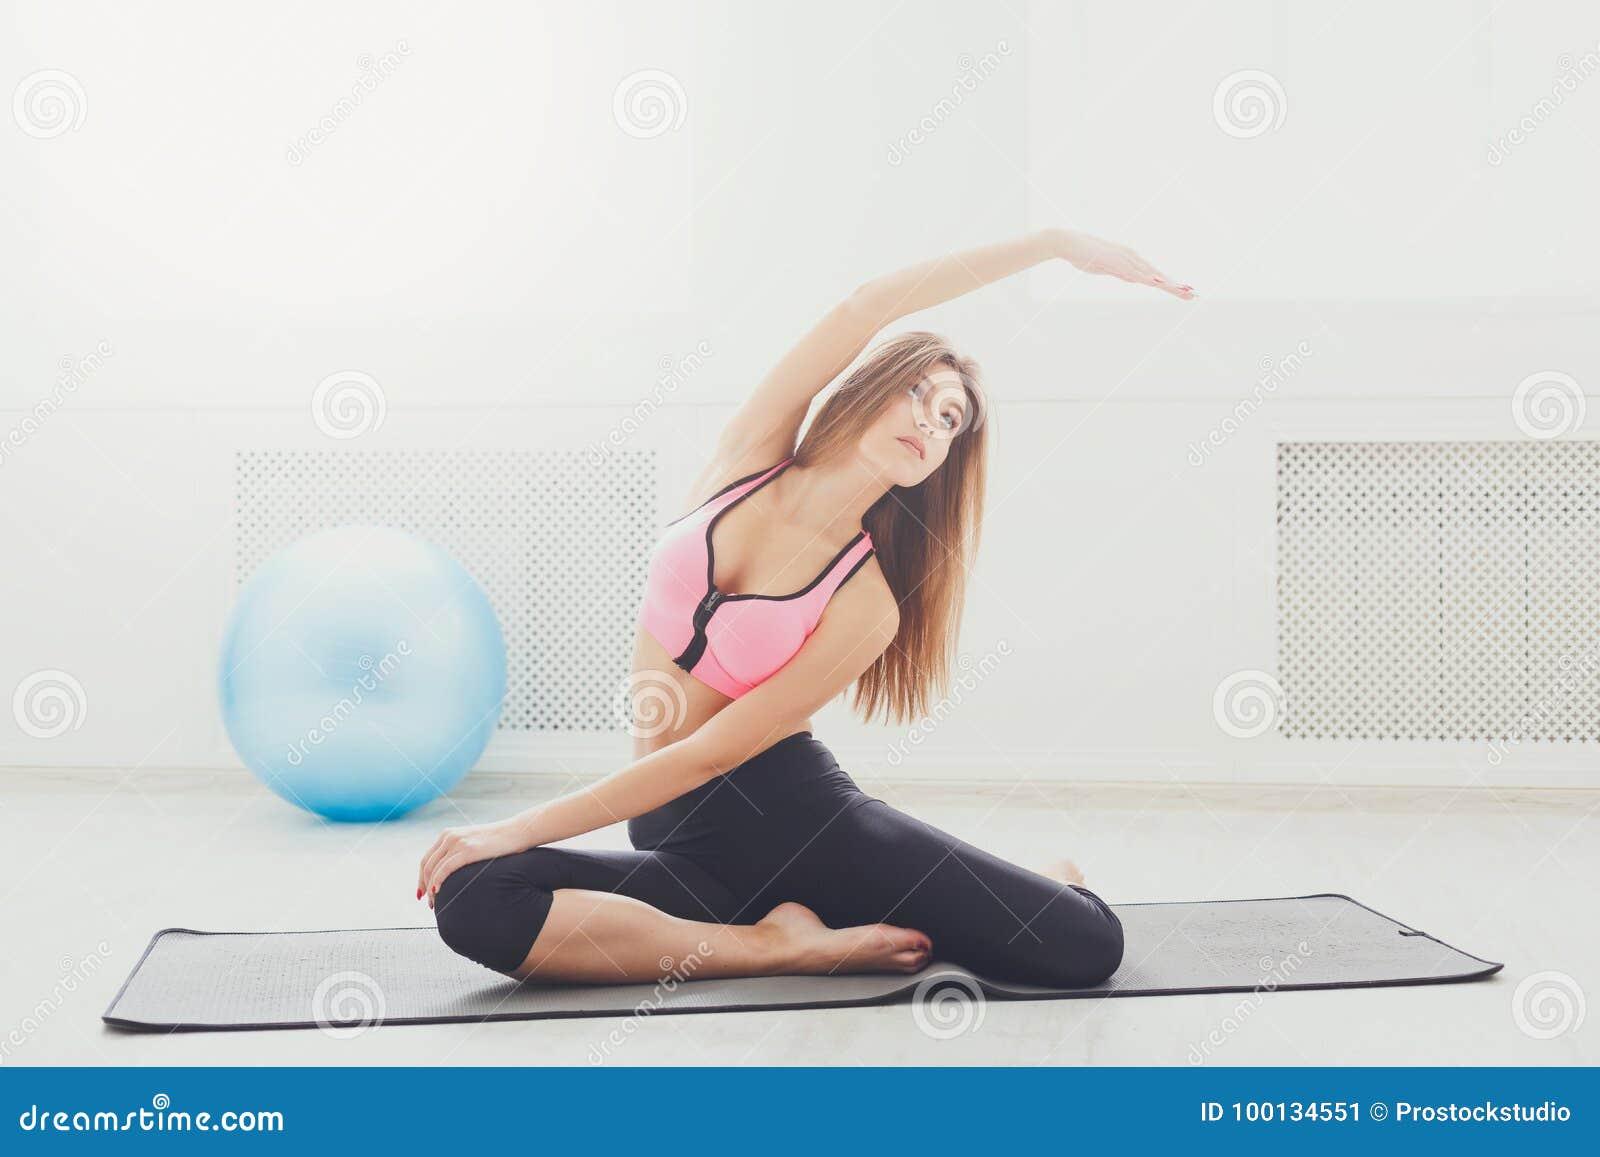 Woman Practicing Flexible Yoga Pose Stock Image Image Of